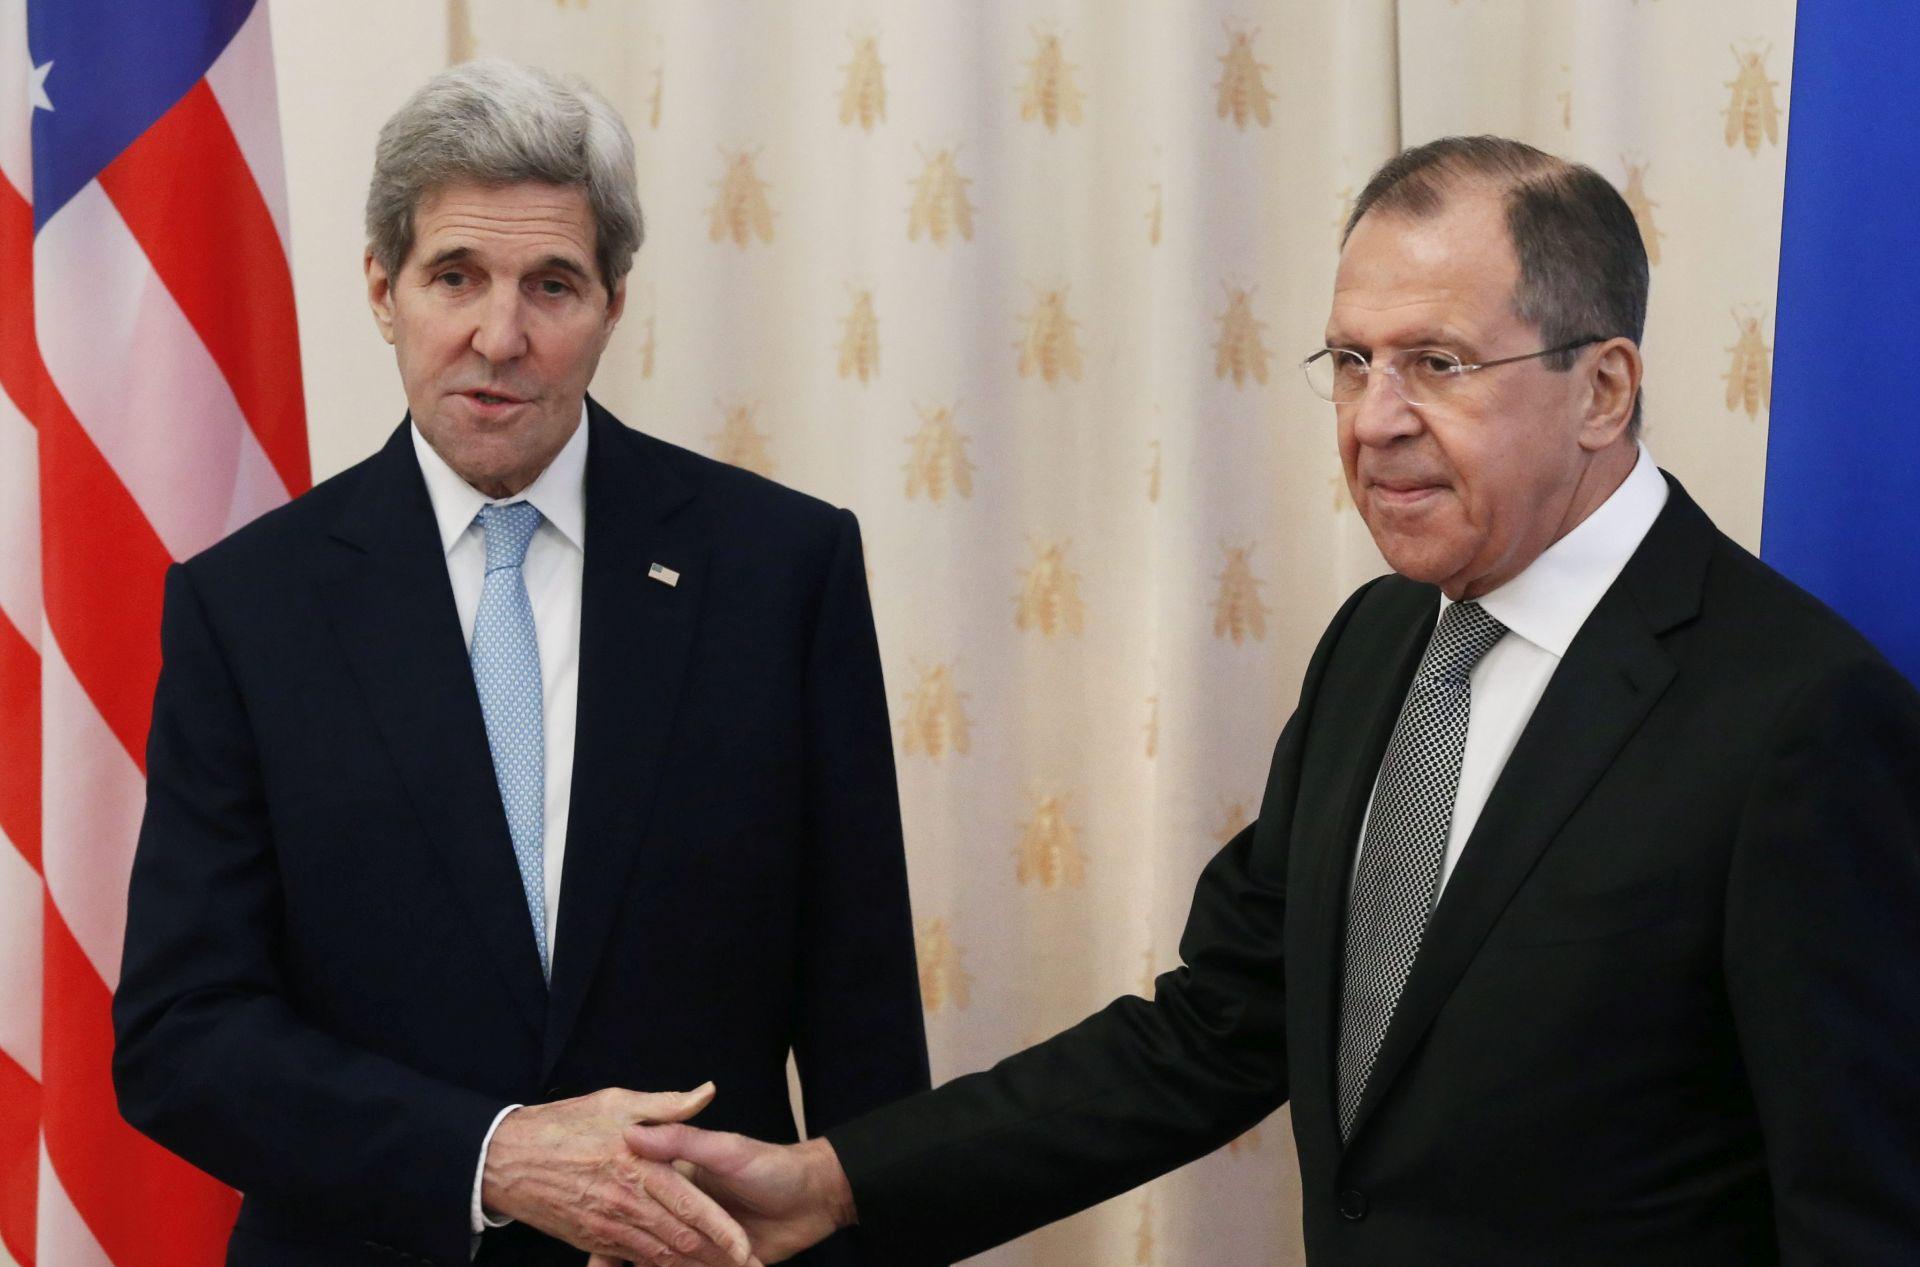 Moskva: Lavrov i Kerry odali počast žrtvama u Nici